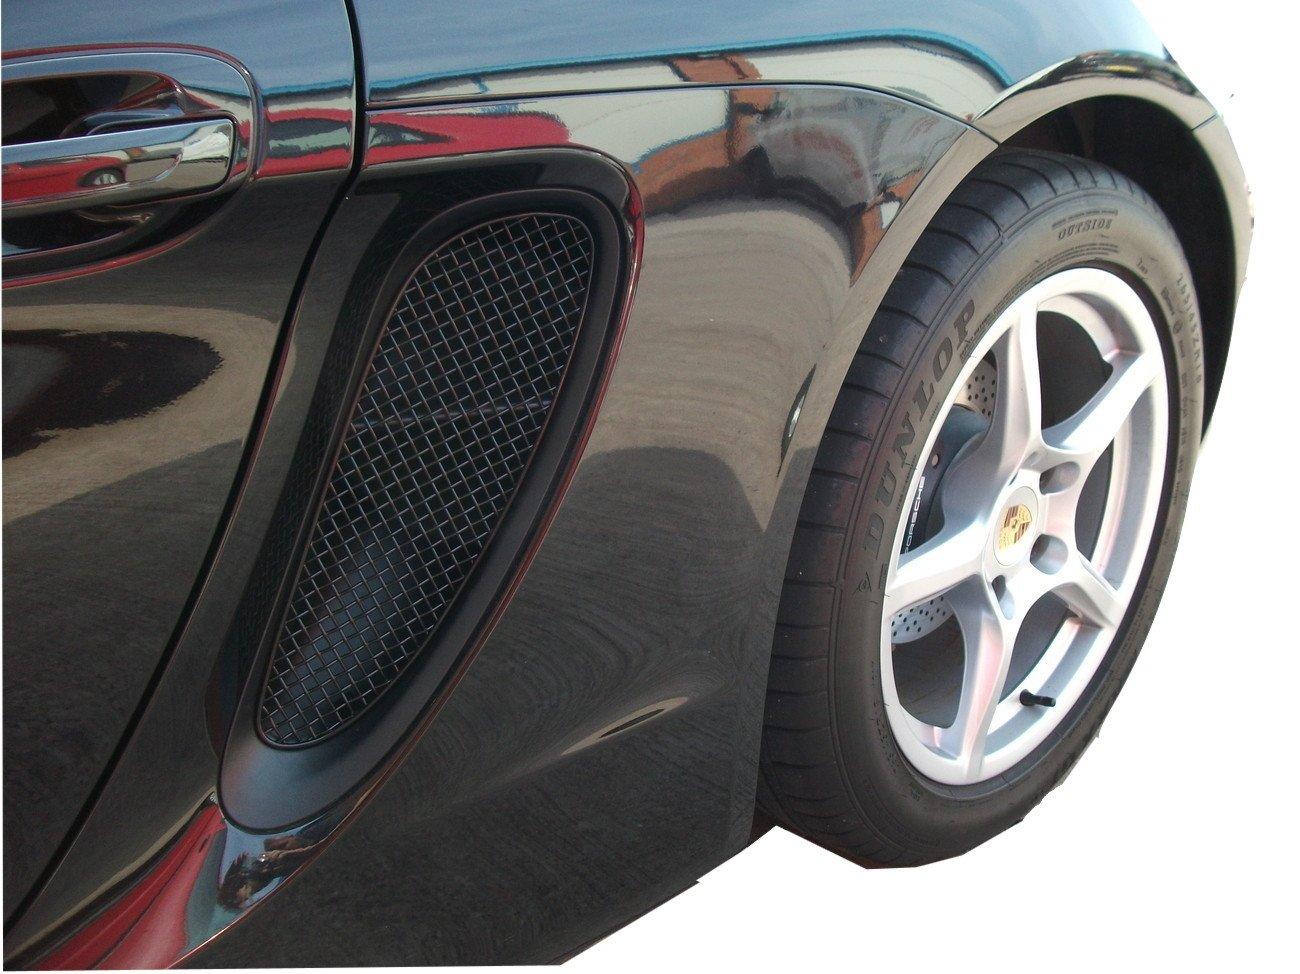 Zunsport Compatible Porsche Cayman/Boxster 981 (All) - Side Vents Grille Set - Black Finish (2012 to 2016) ZPR43212B